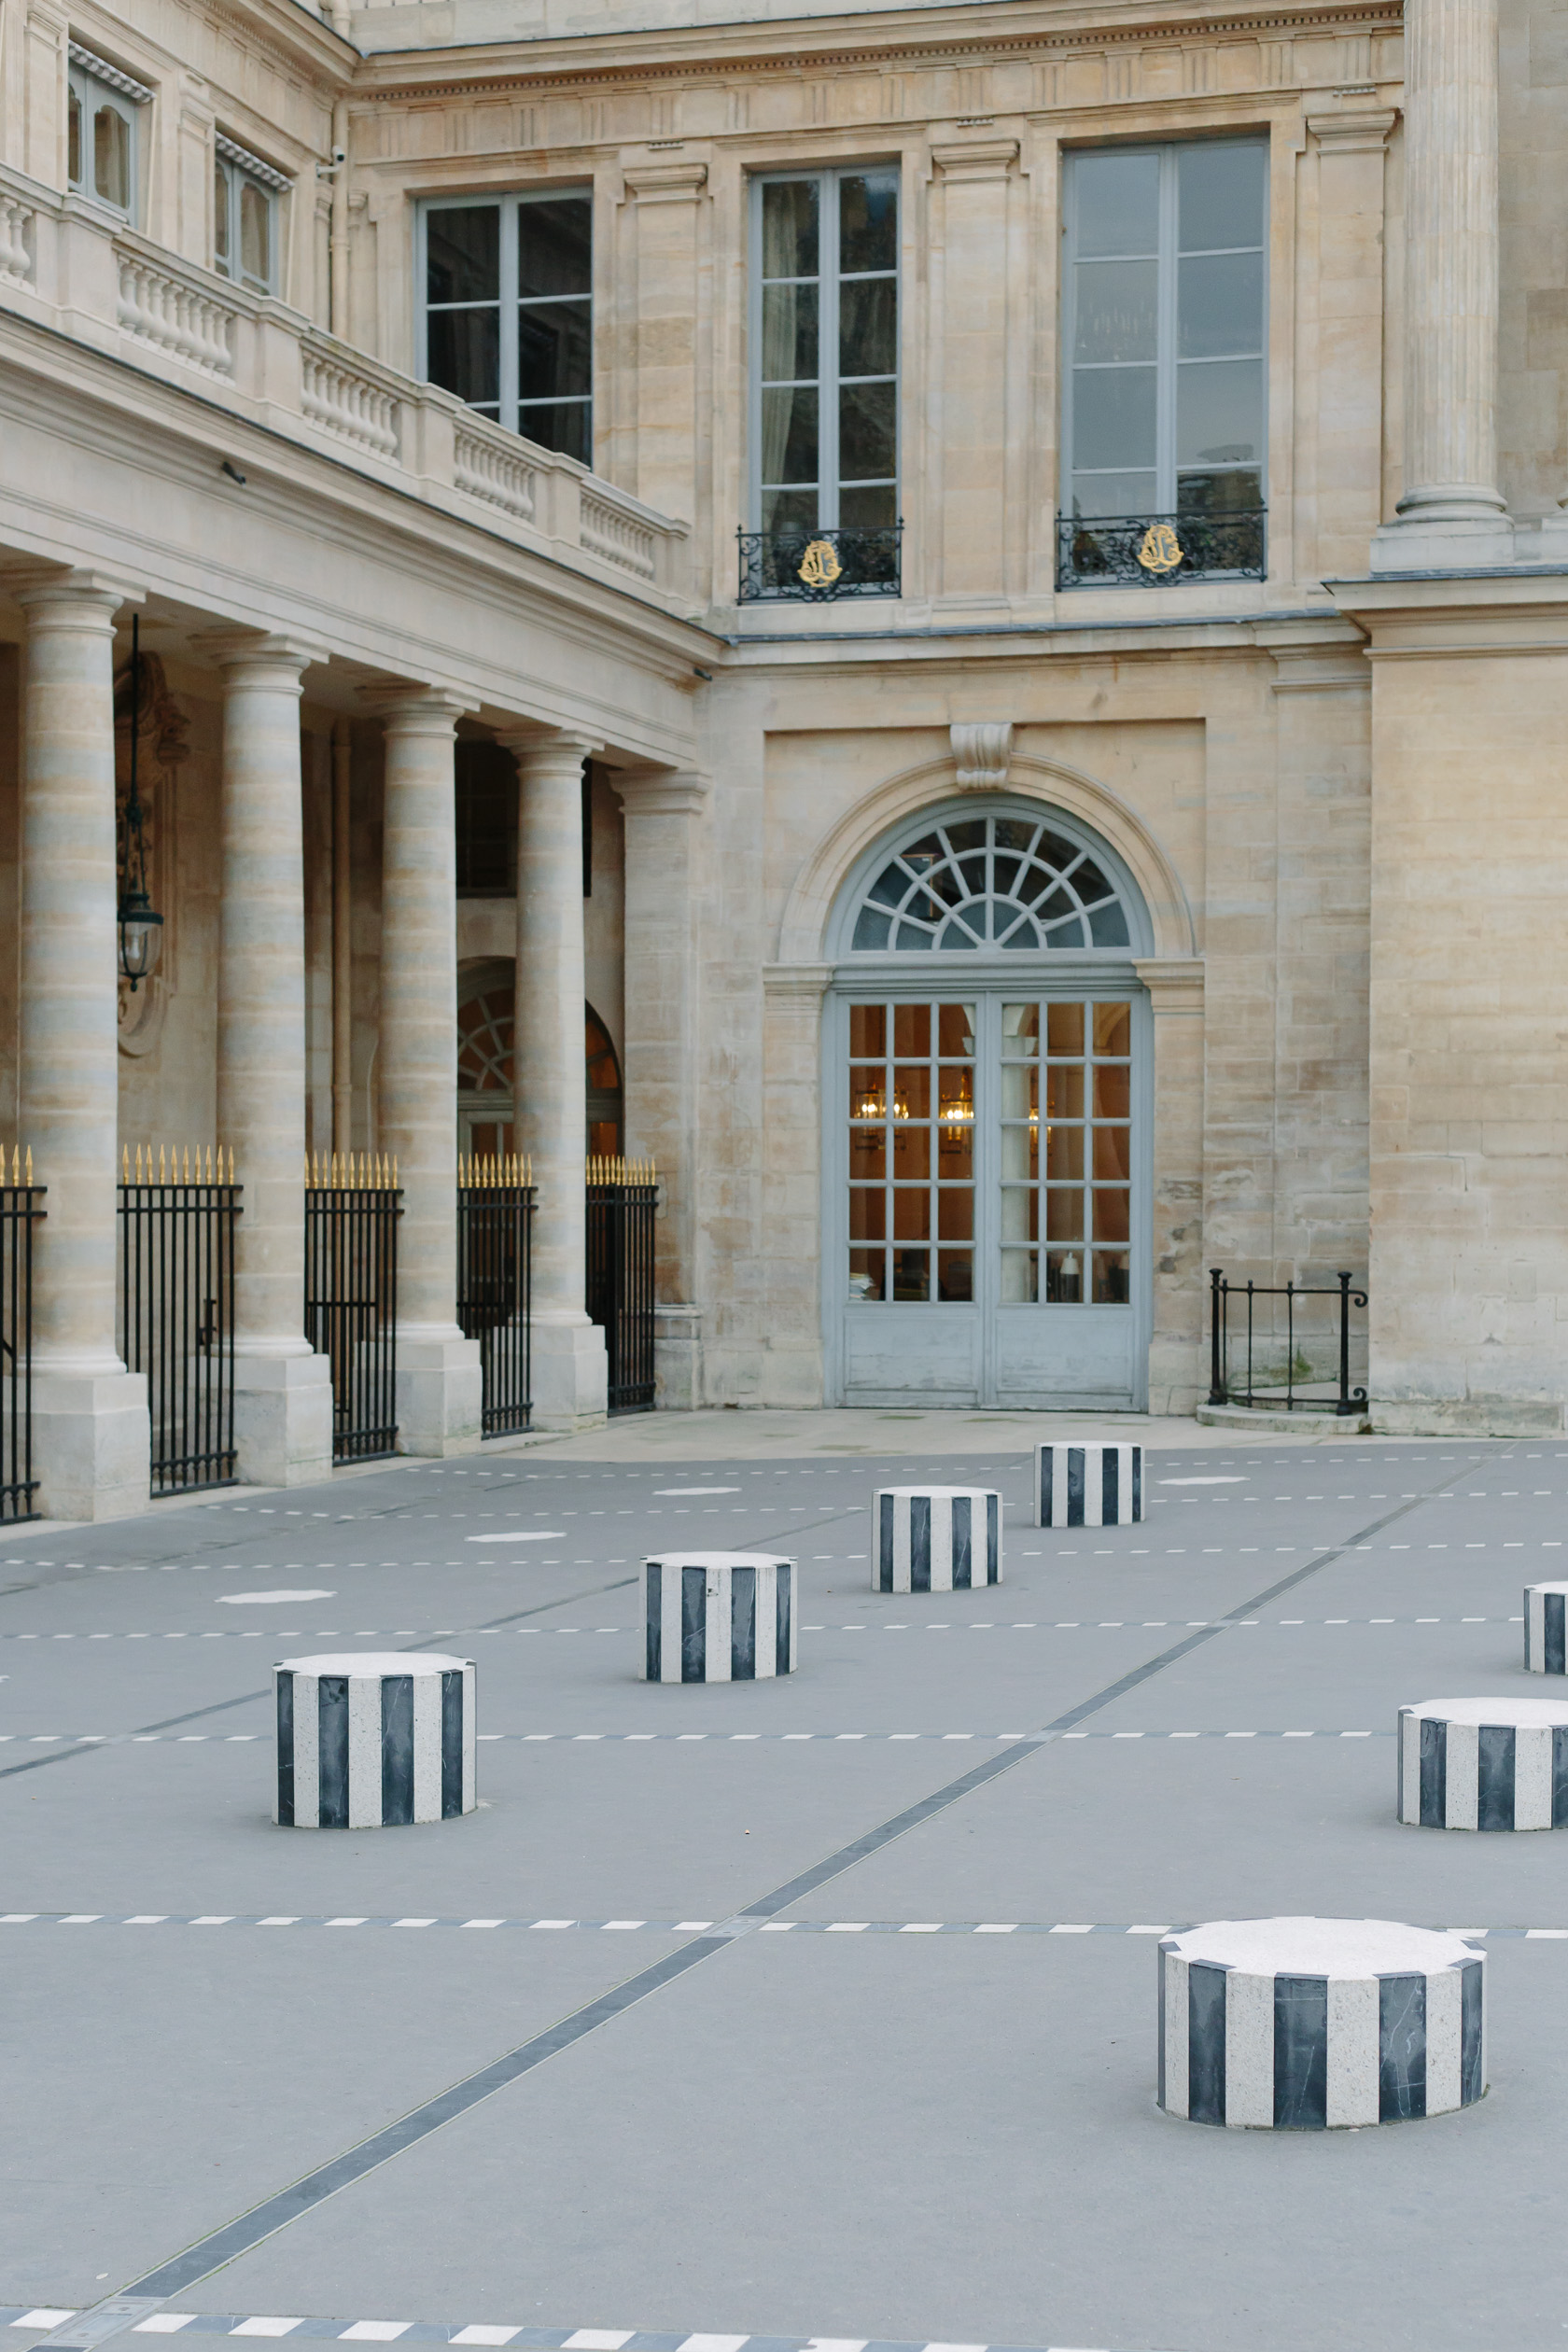 paris photo essays palais royal york avenue paris photo essays palais royal